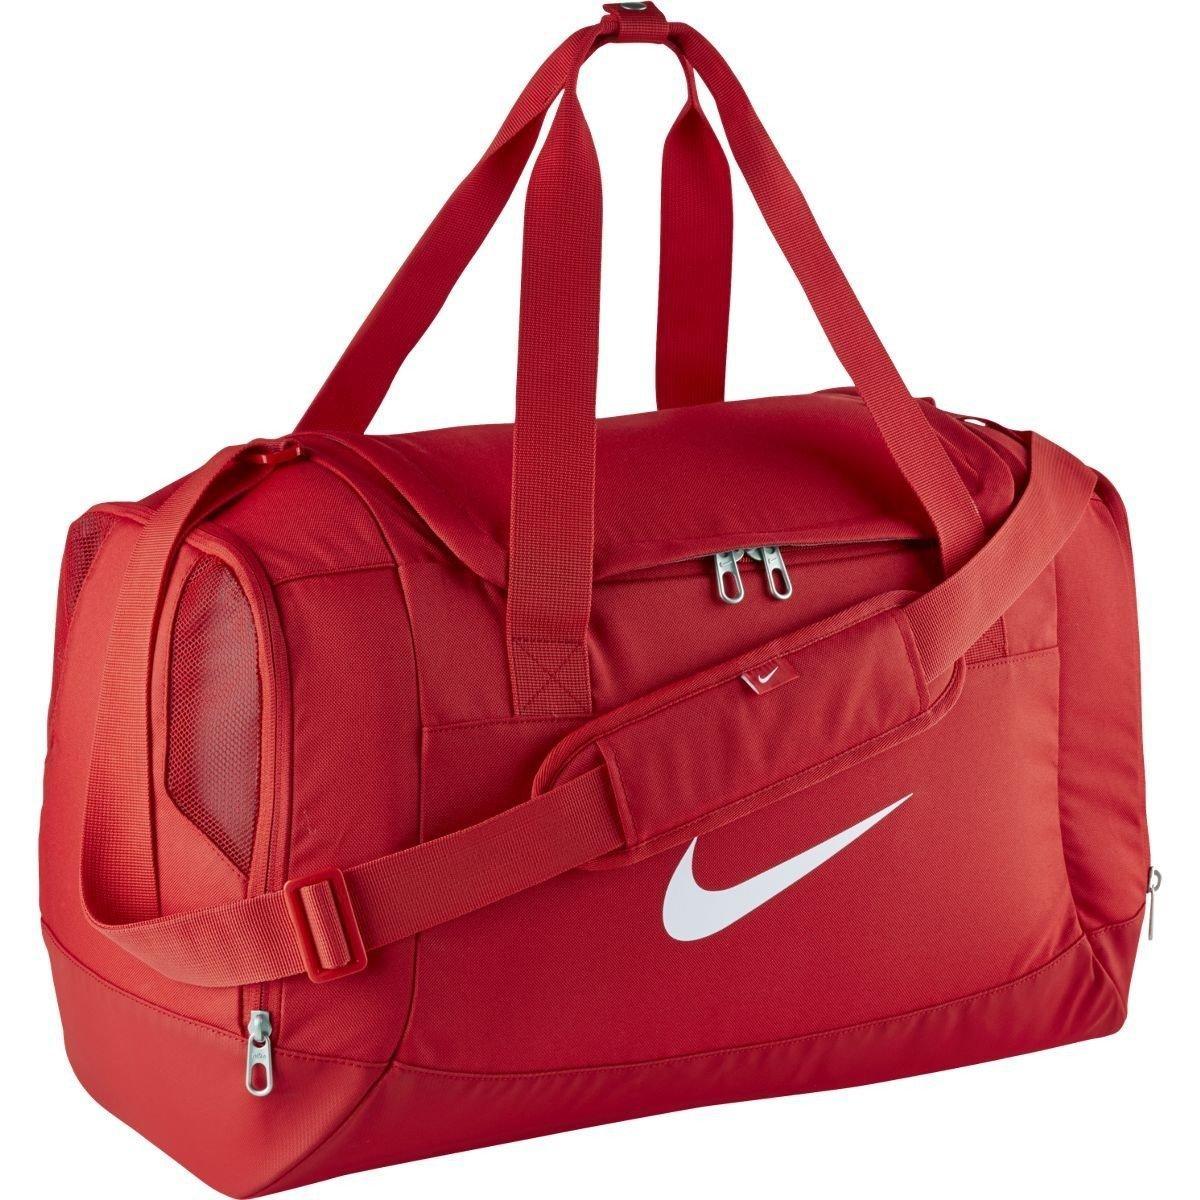 [Premium] Sac de sport Nike Club Team Swoosh Duffel